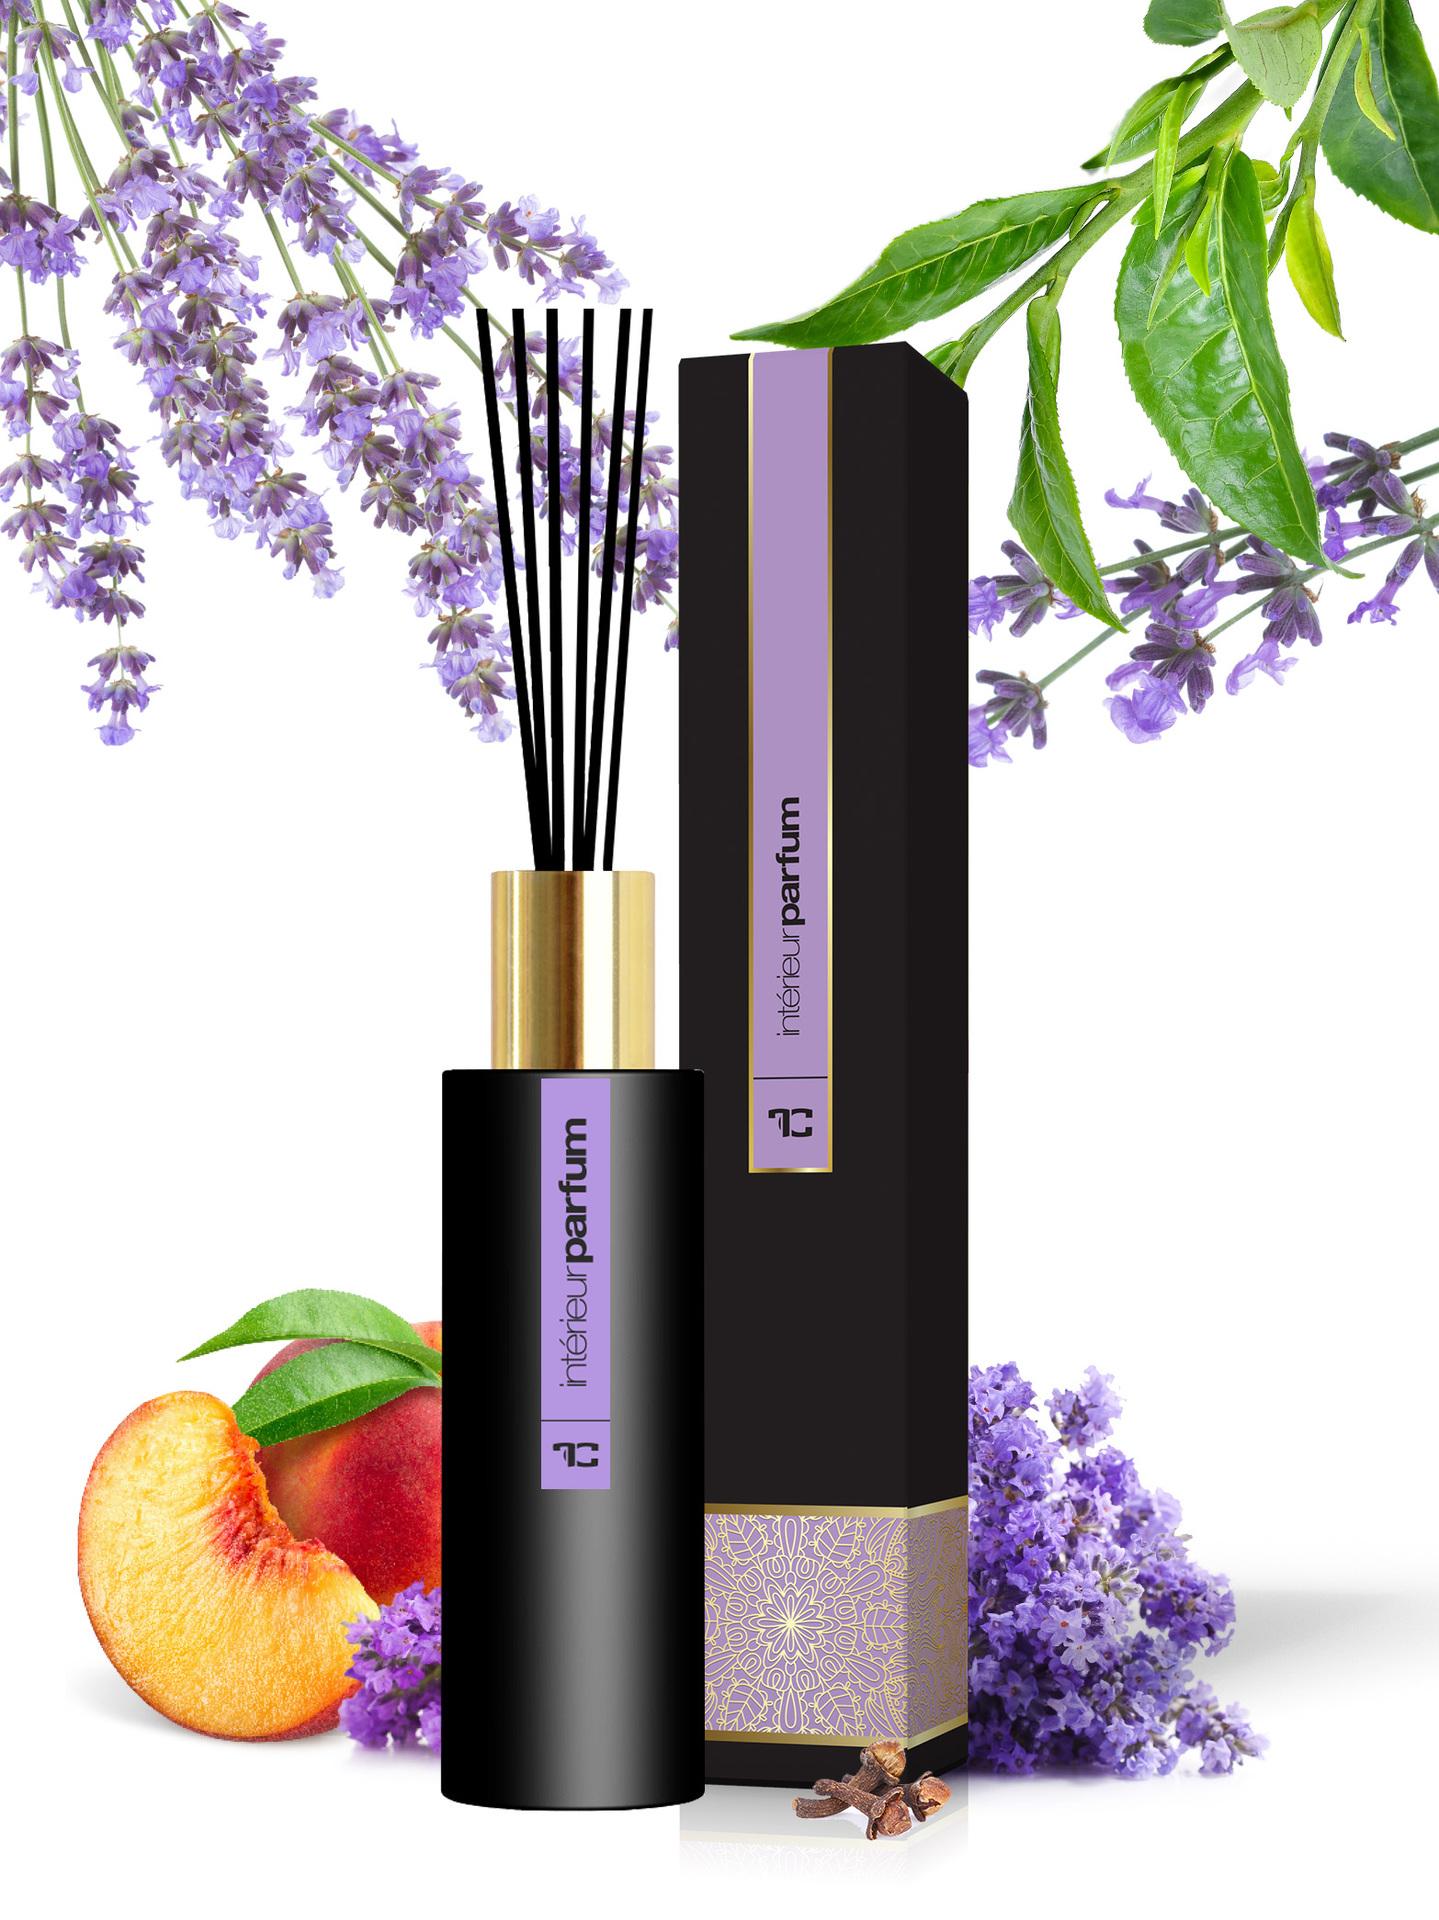 Interiérový parfém, RELAXATION levandule, vonný roztok s vysokým obsahem parfémové kompozice